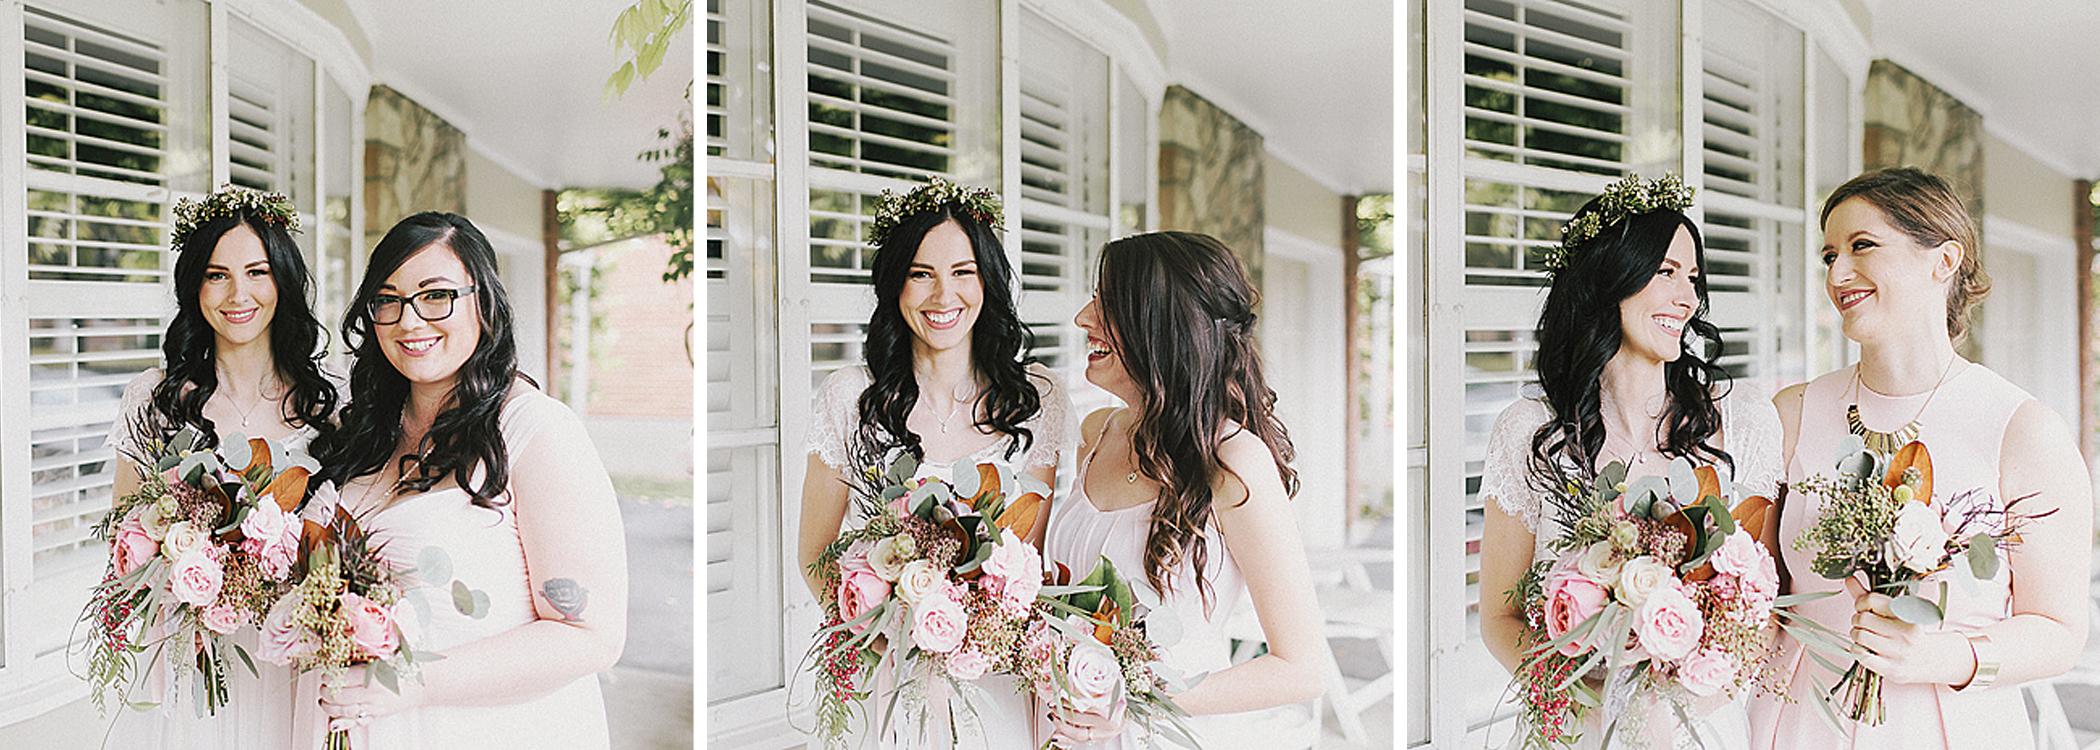 richard-and-christy-wedding-057.jpg